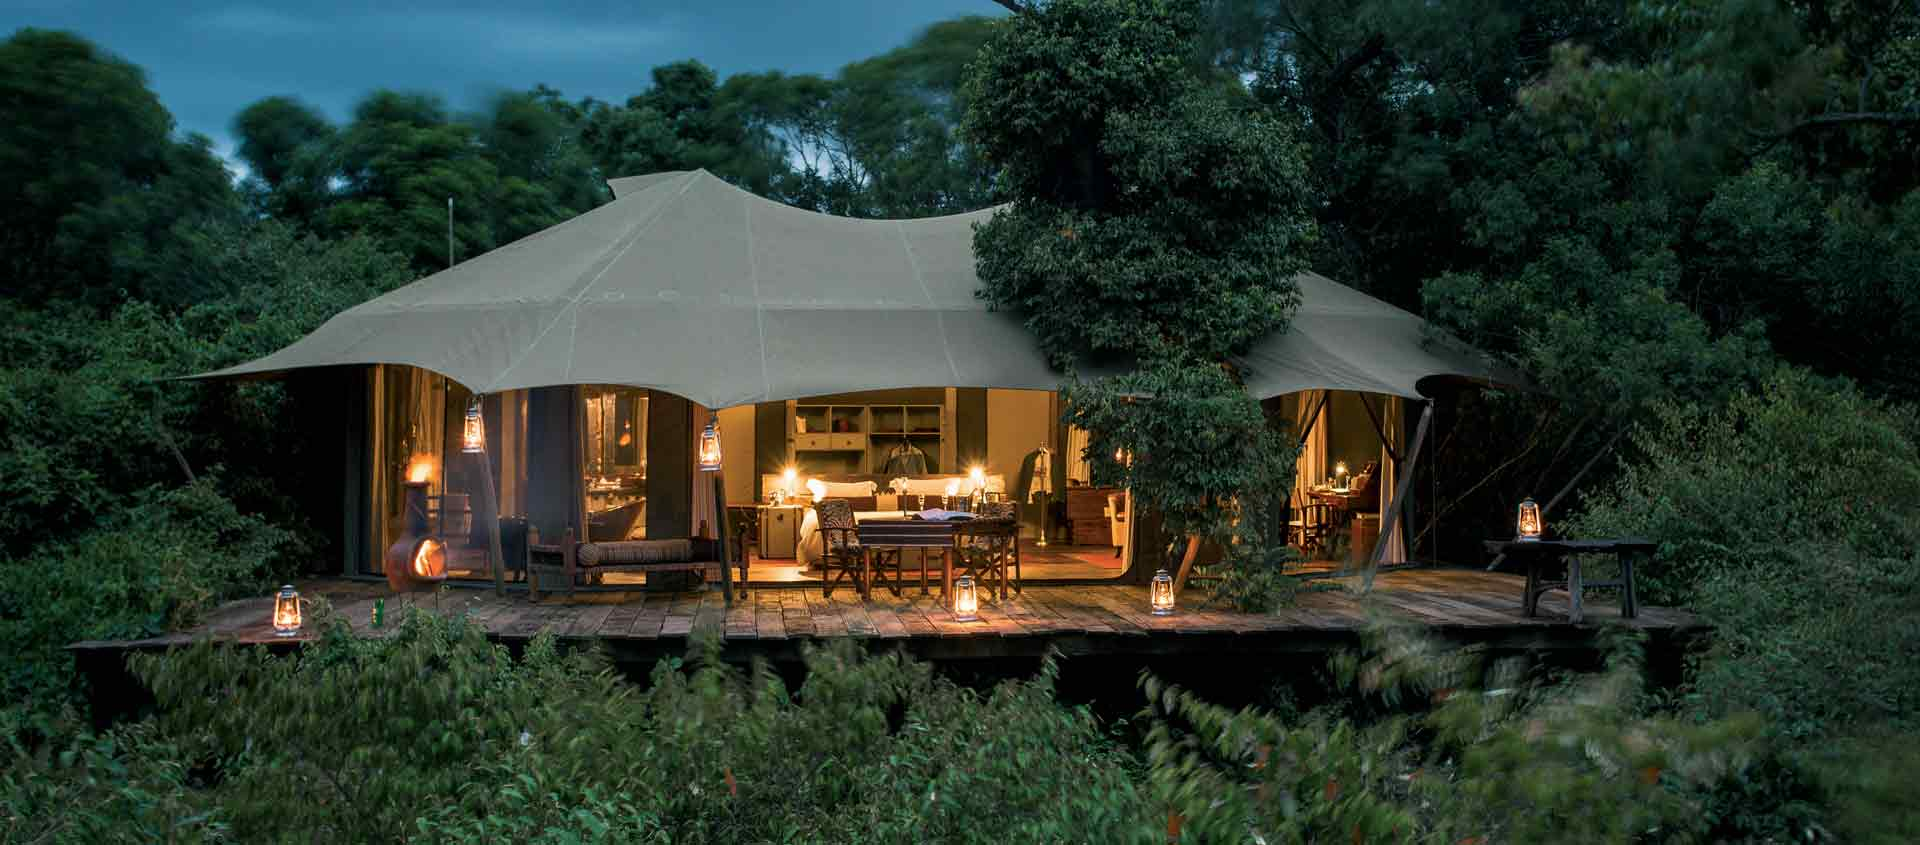 Kenya private wildlife reserves photo of Mara Plains Camp